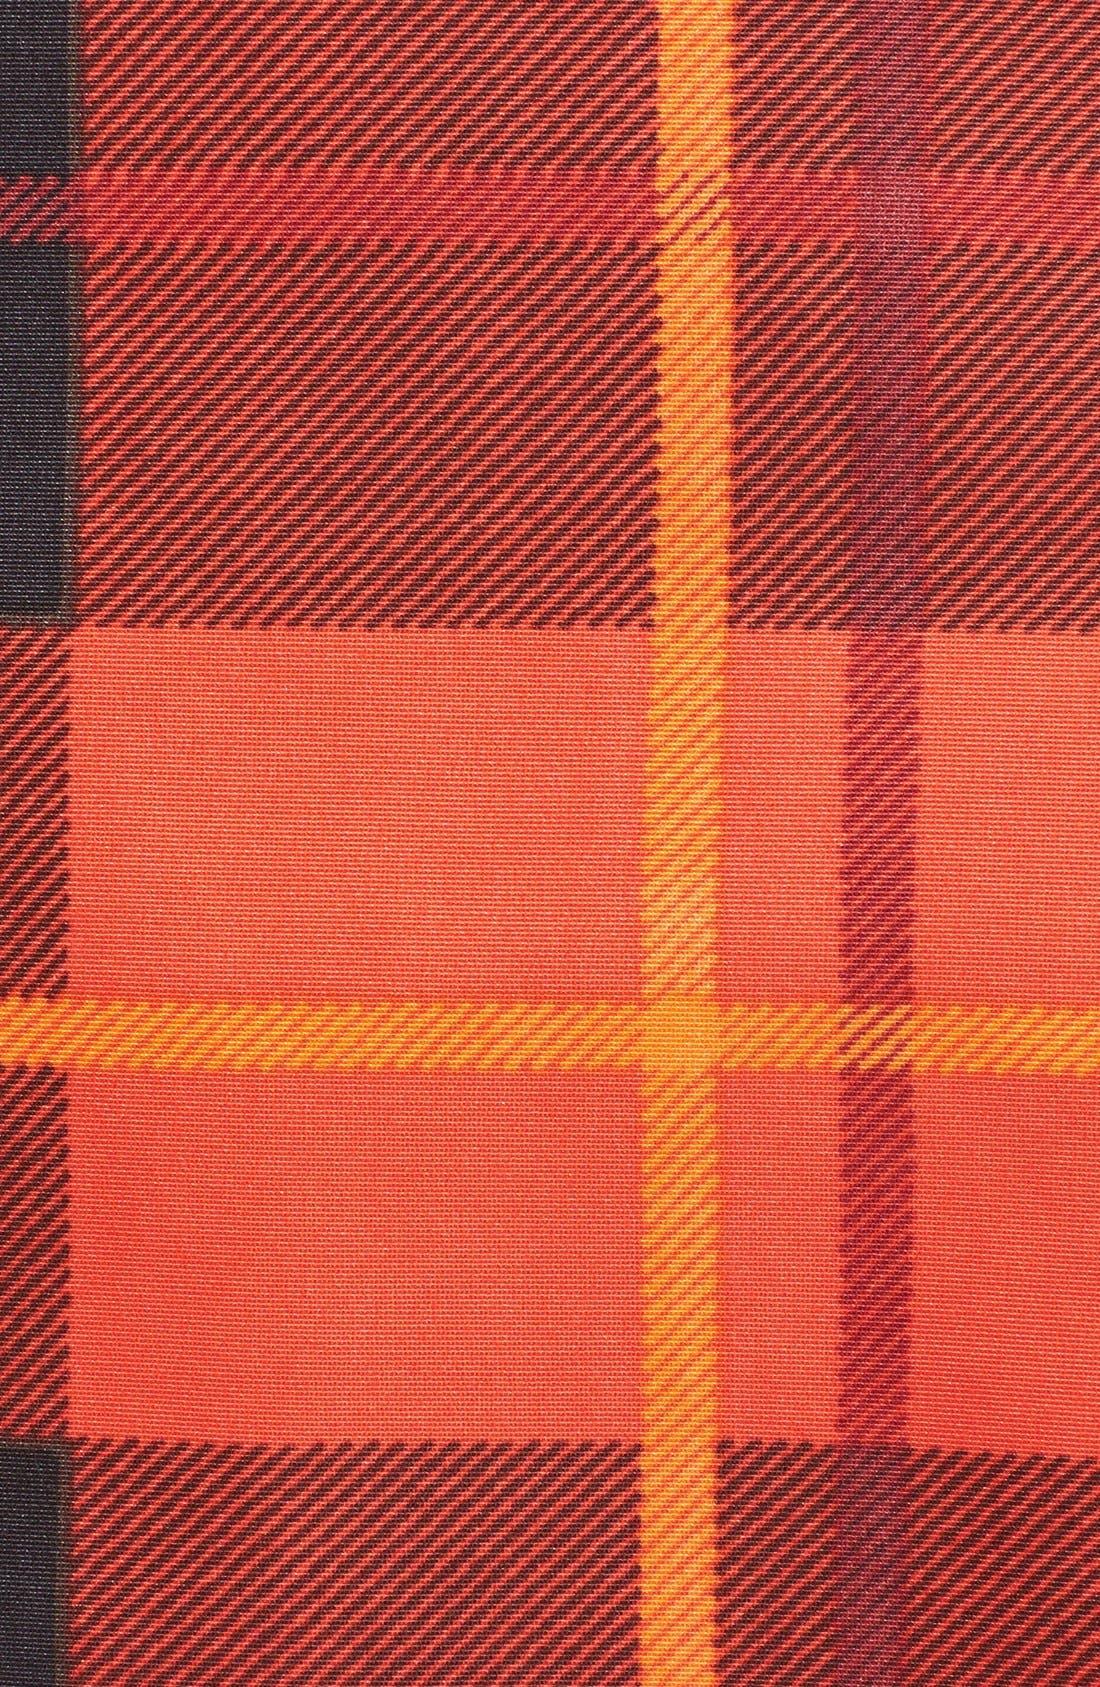 KATE SPADE NEW YORK,                             katespade new yorkwoodland plaid midi skirt,                             Alternate thumbnail 3, color,                             601